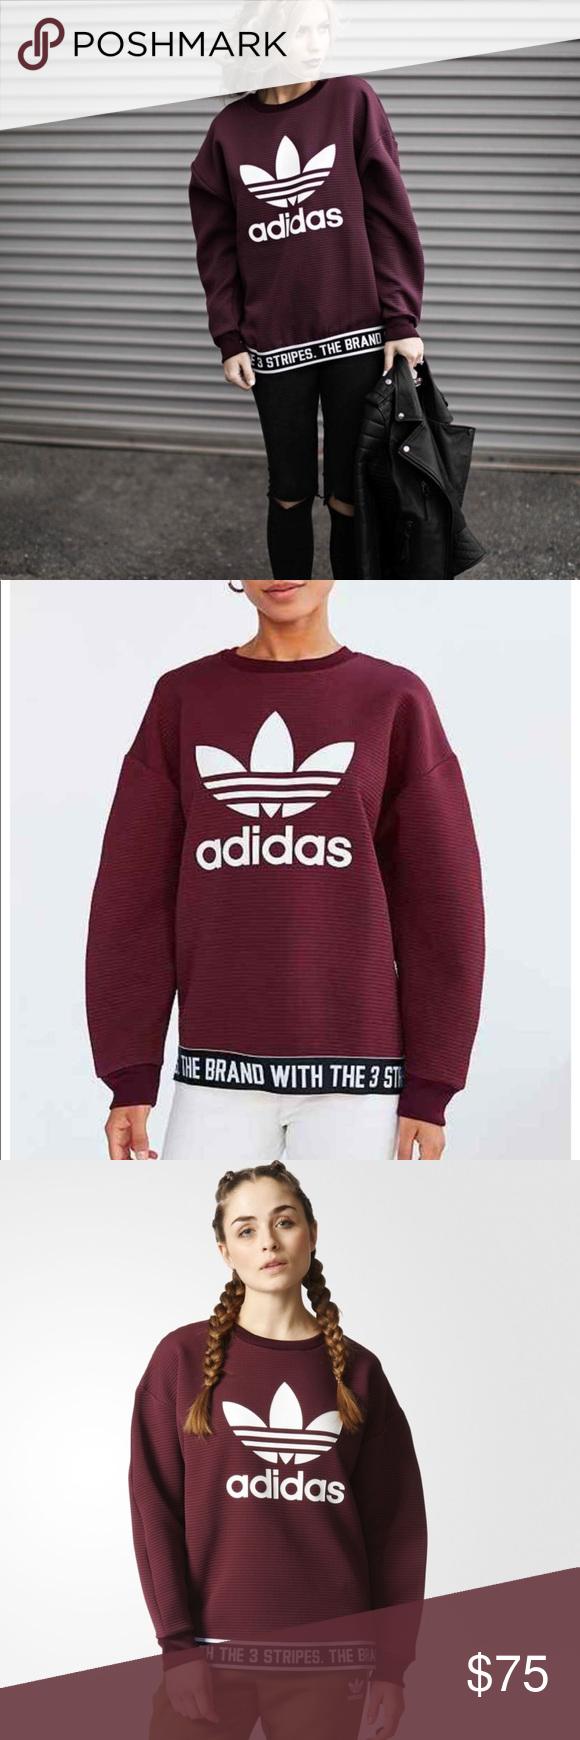 Adidas Originals Trefoil Crewneck Sweatshirt Clothes Design Sweatshirts Fashion Design [ 1740 x 580 Pixel ]